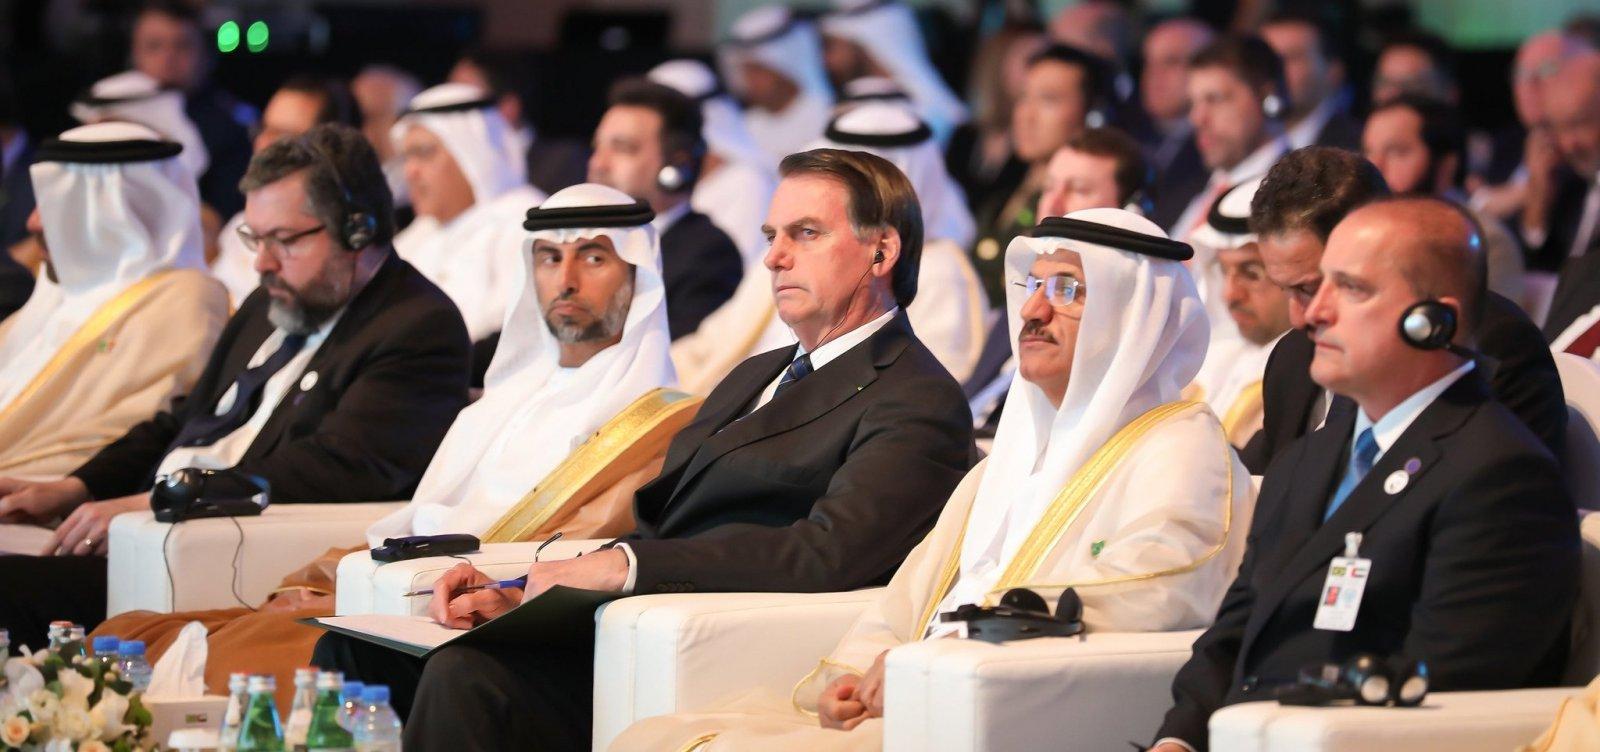 Bolsonaro e xeique dos Emirados Árabes assinam acordo de comércio